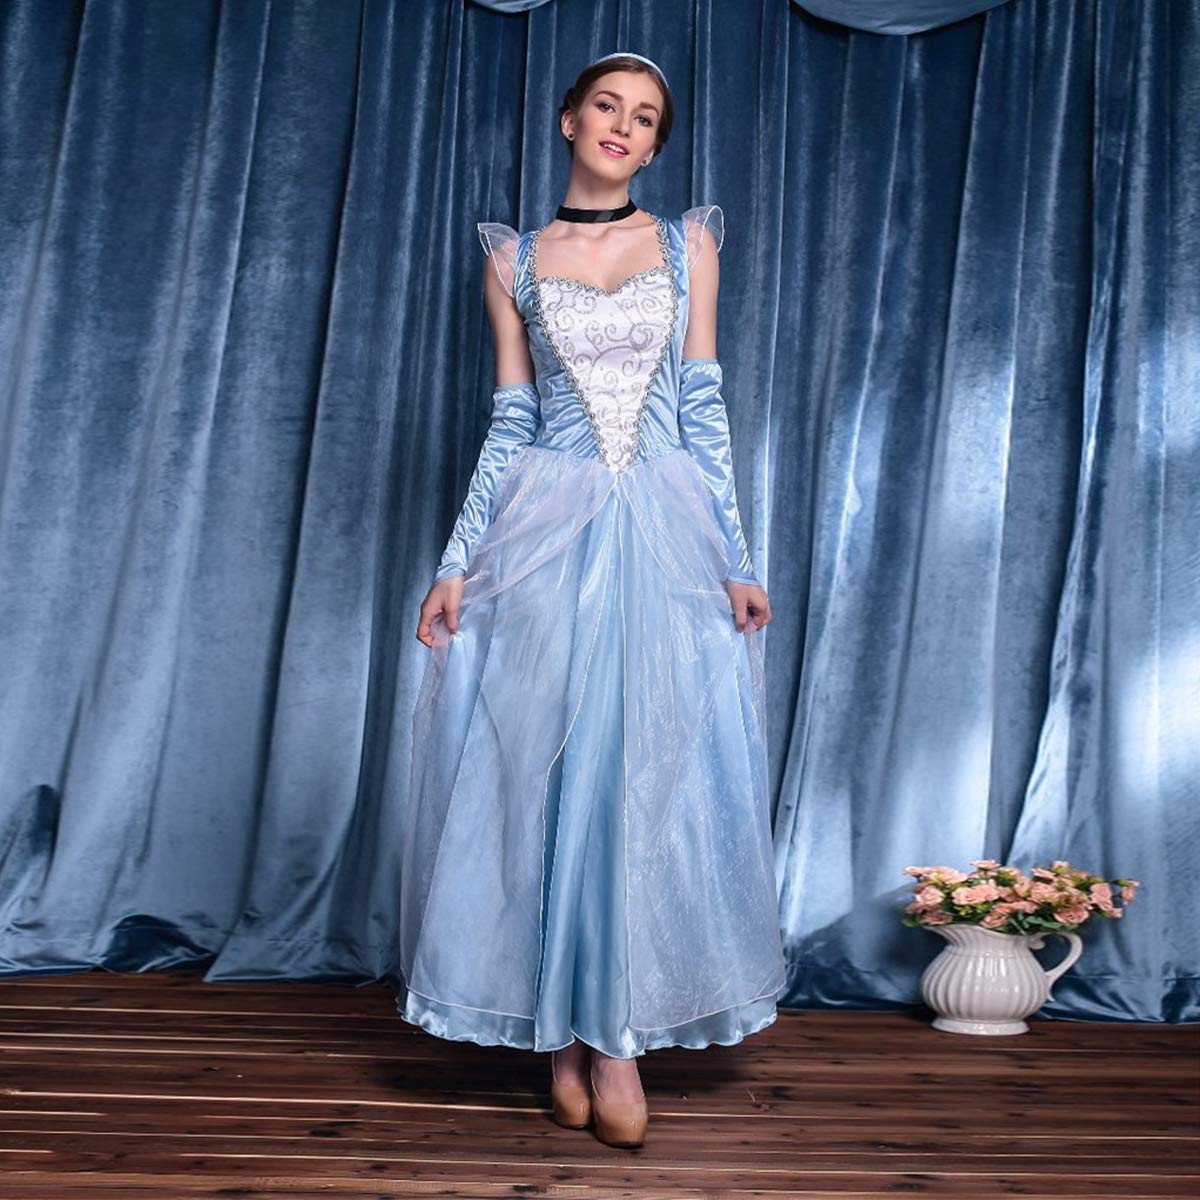 OwlFay Donna Vestito da Cenerentola Elsa Carnevale Costume per Halloween Festa Cosplay Fancy Dress Up Vestiti S-2XL